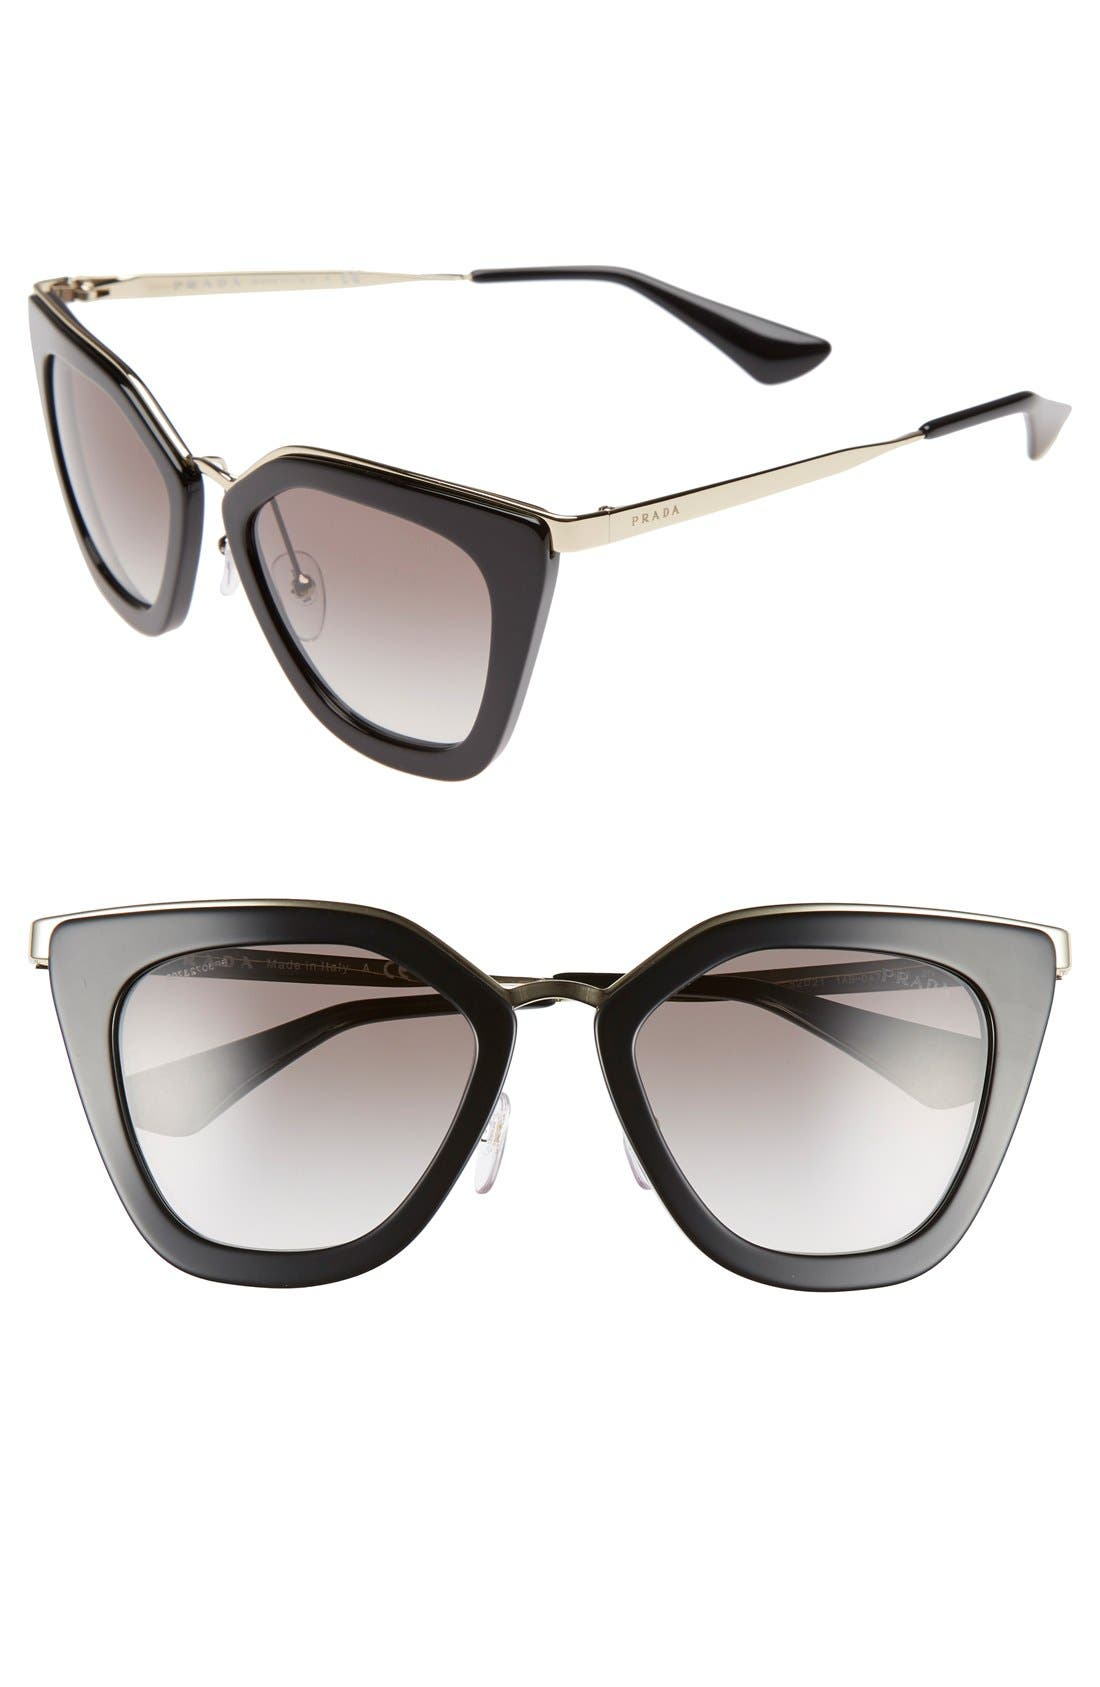 Main Image - Prada 52mm Cat Eye Sunglasses